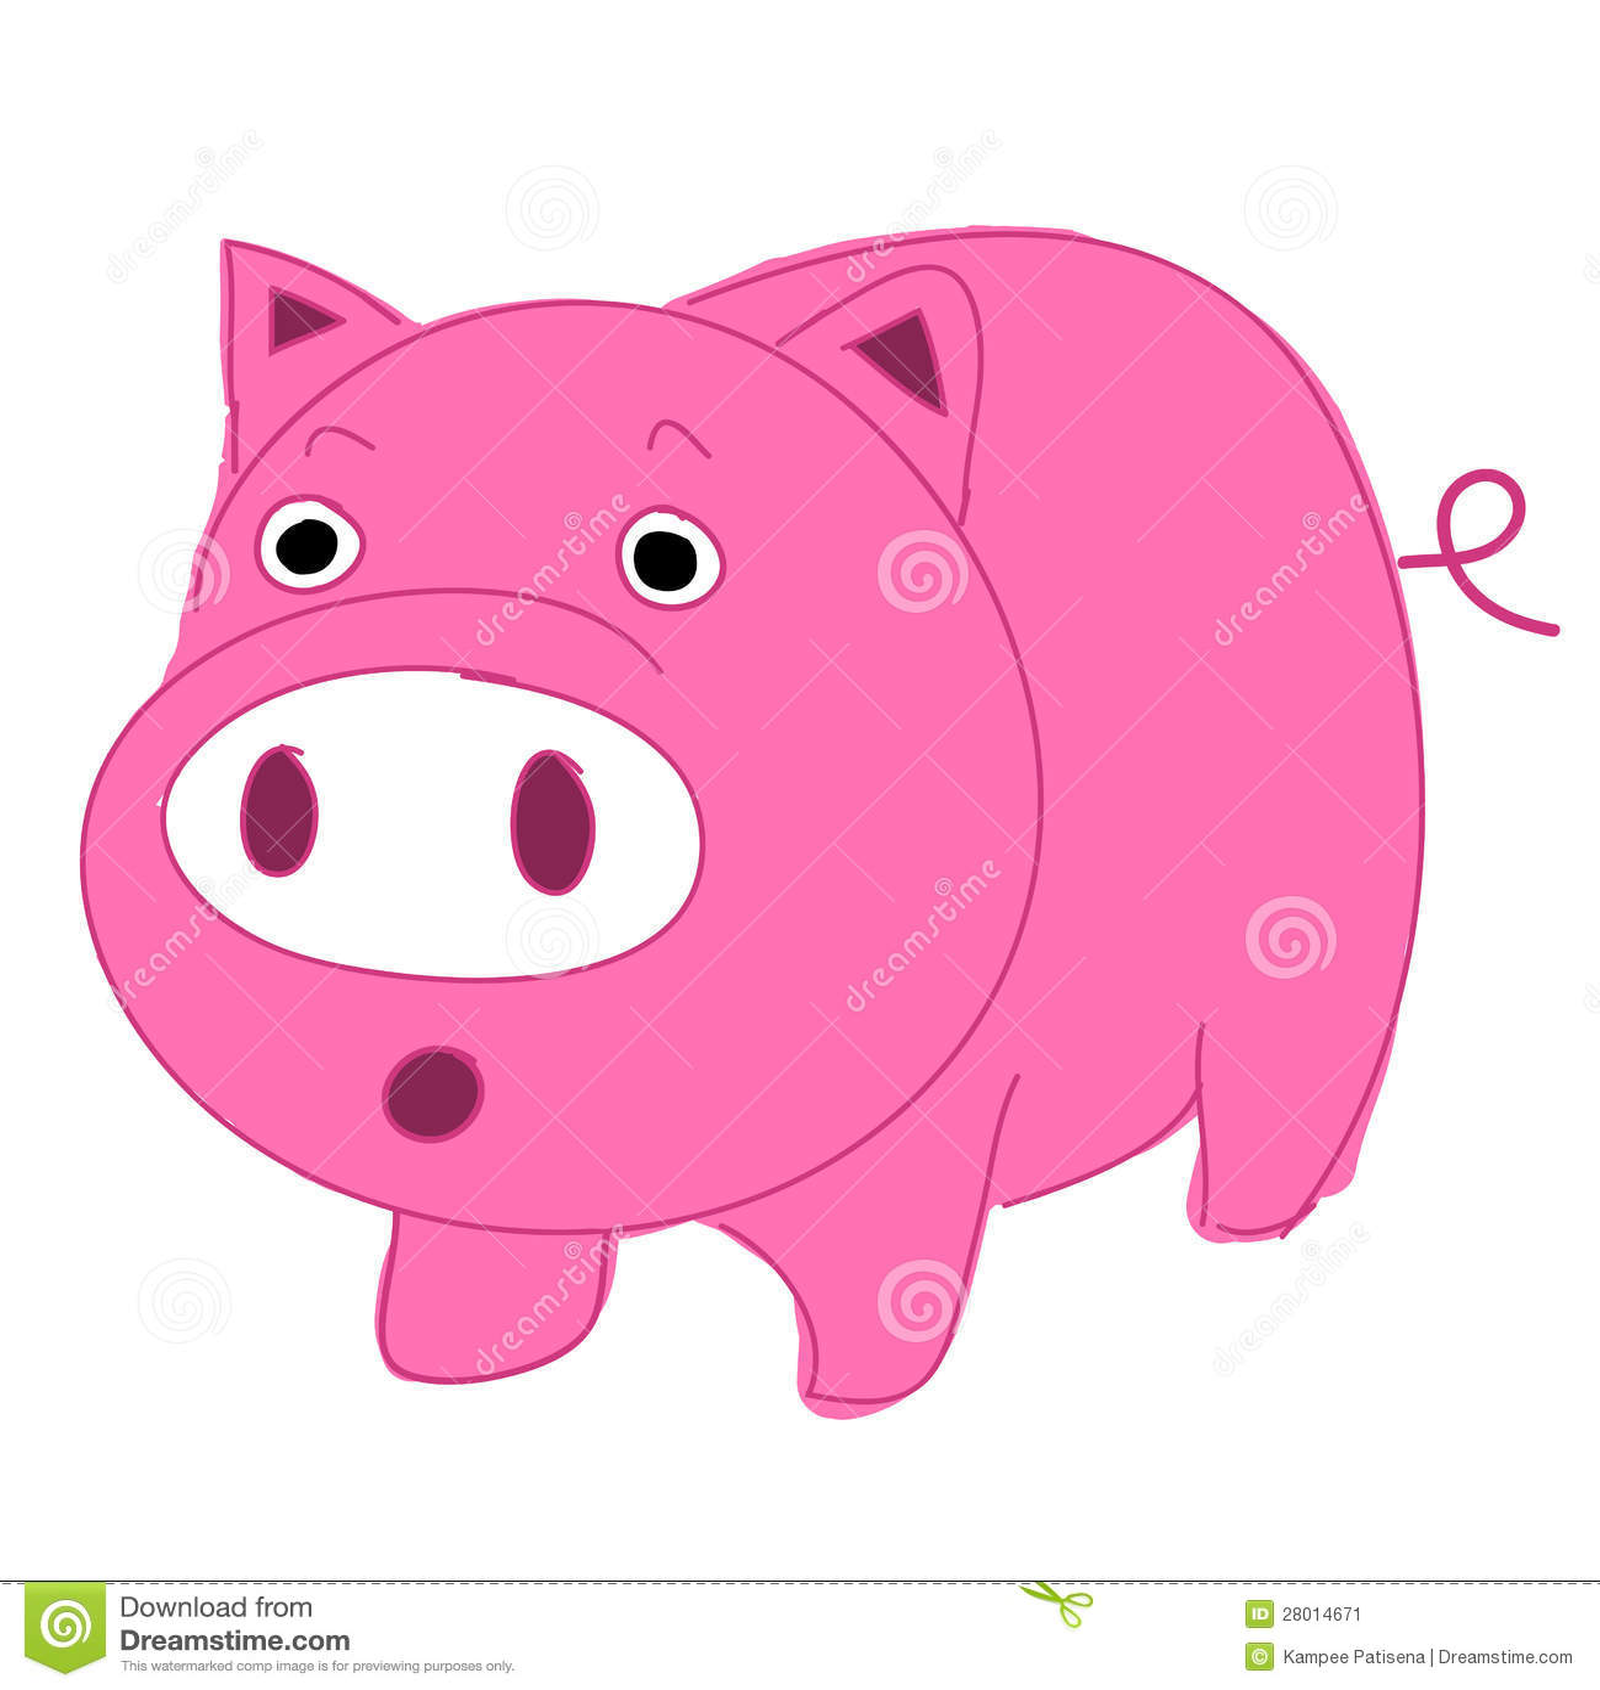 Cute, Fun And Funny Cartoon Pig Stock Image - Image: 28014671